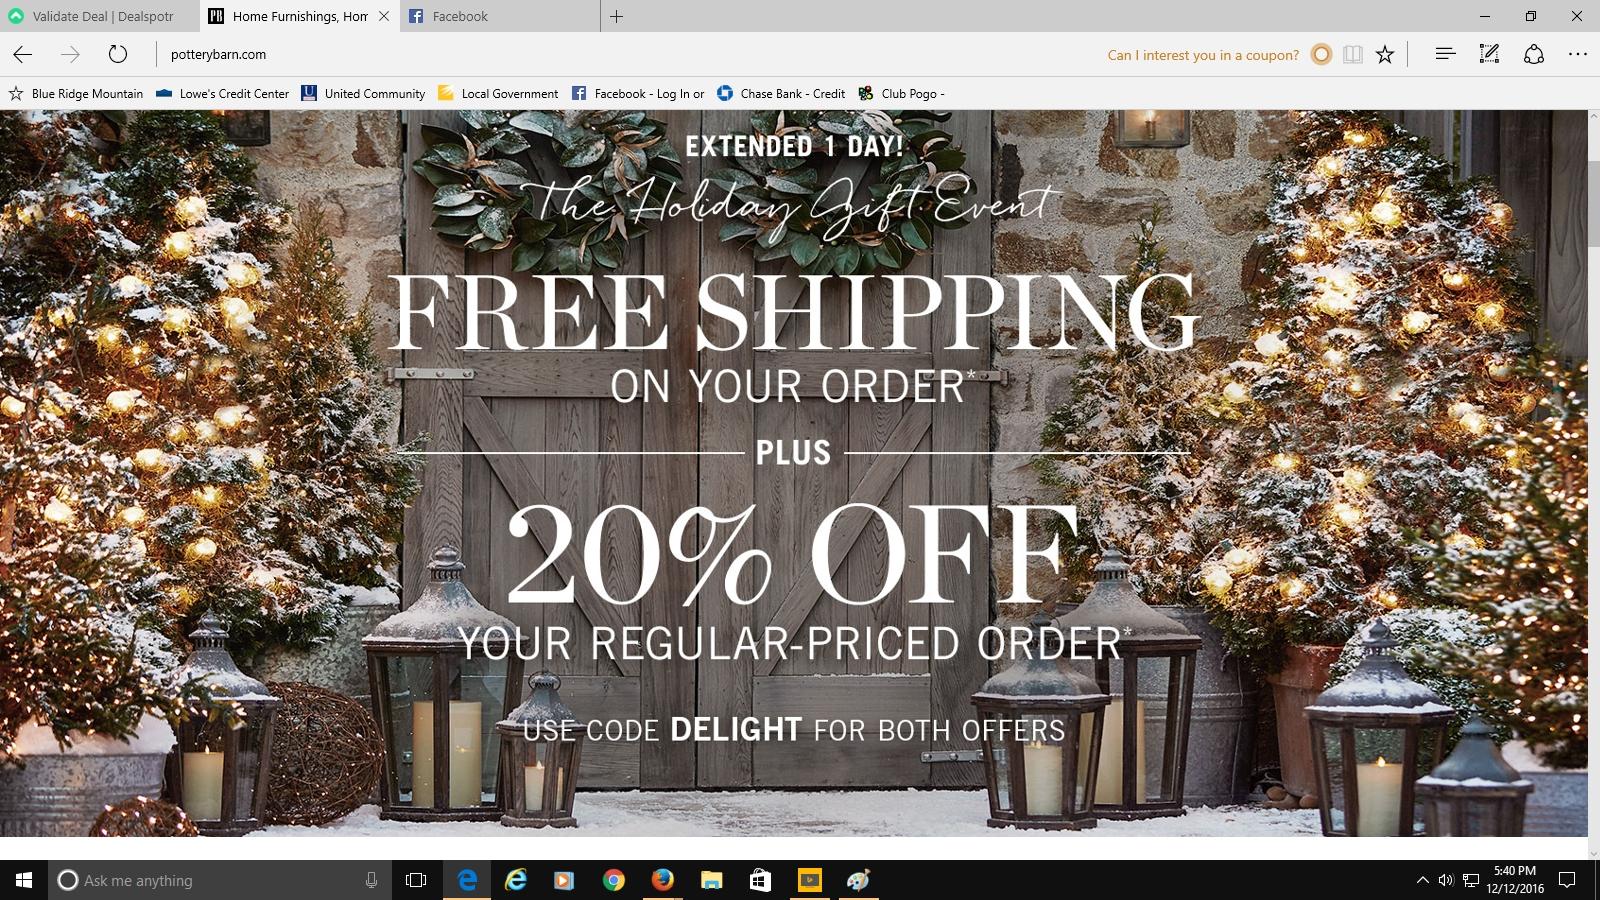 Restoration hardware free shipping coupons